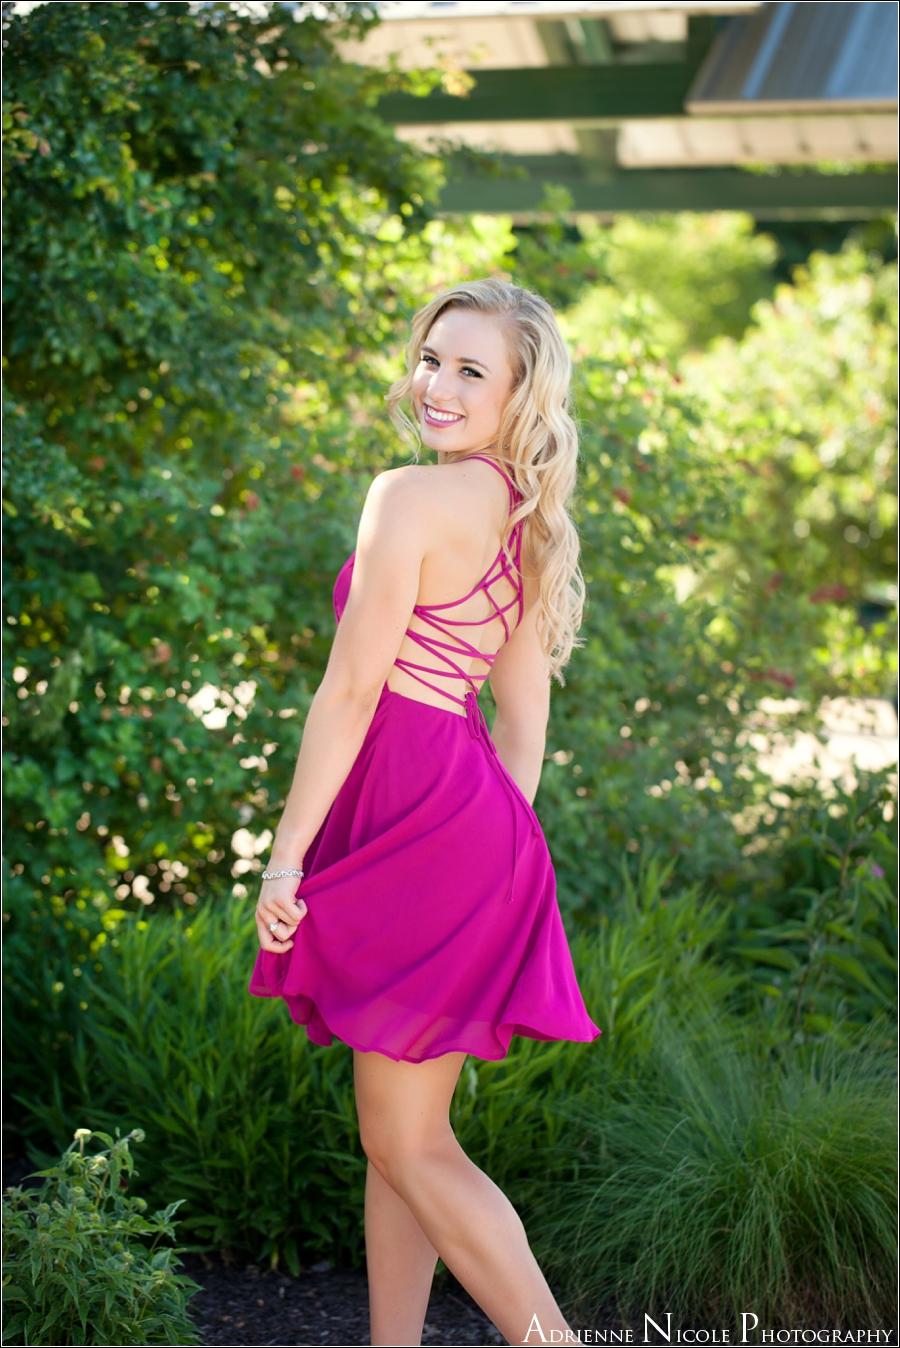 Adrienne Nicole Photography_IndianaSeniorPictures_Avon_0473.jpg